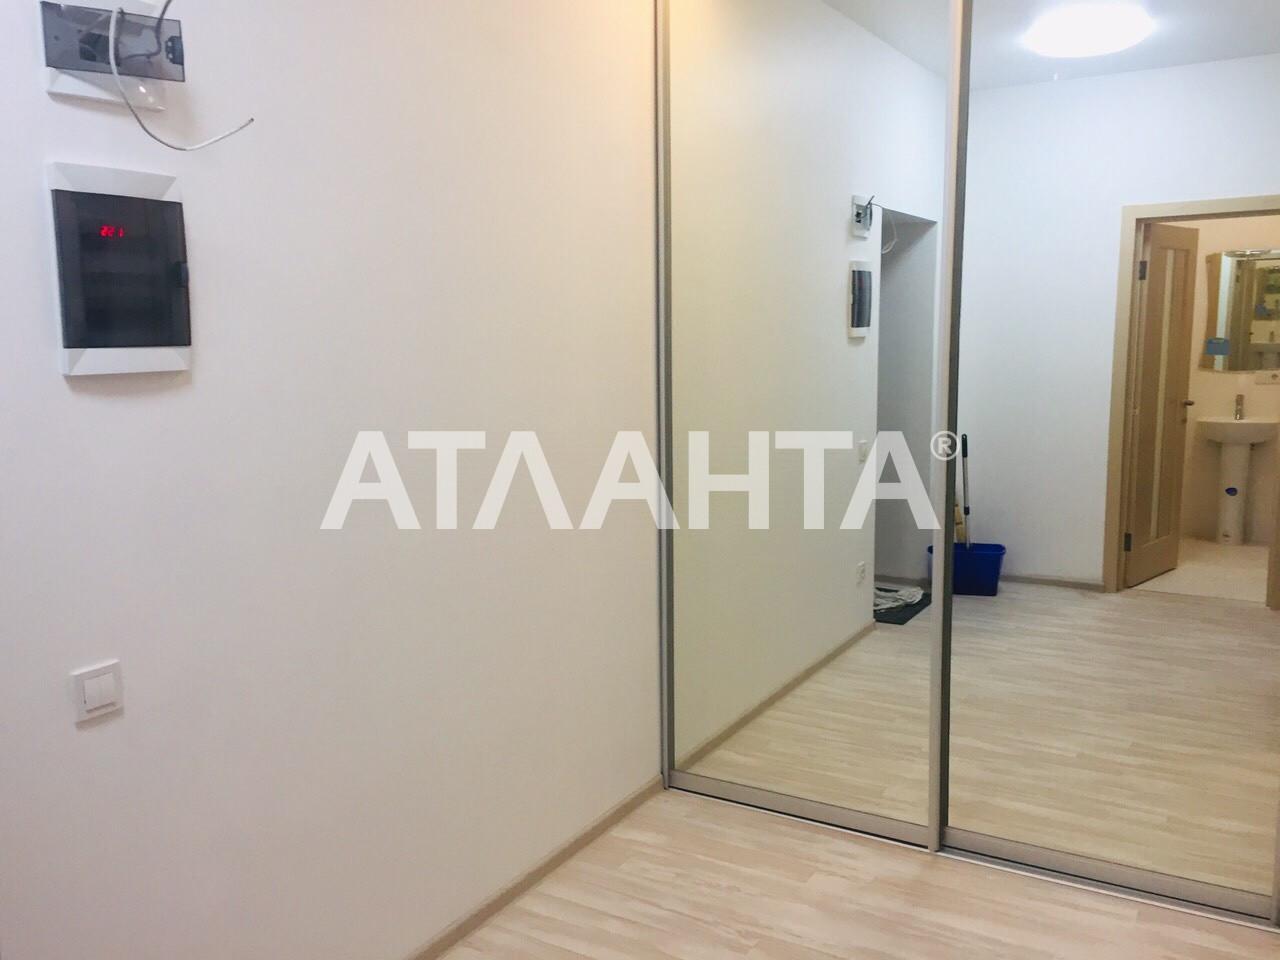 Продается 1-комнатная Квартира на ул. Валовня — 42 000 у.е. (фото №6)